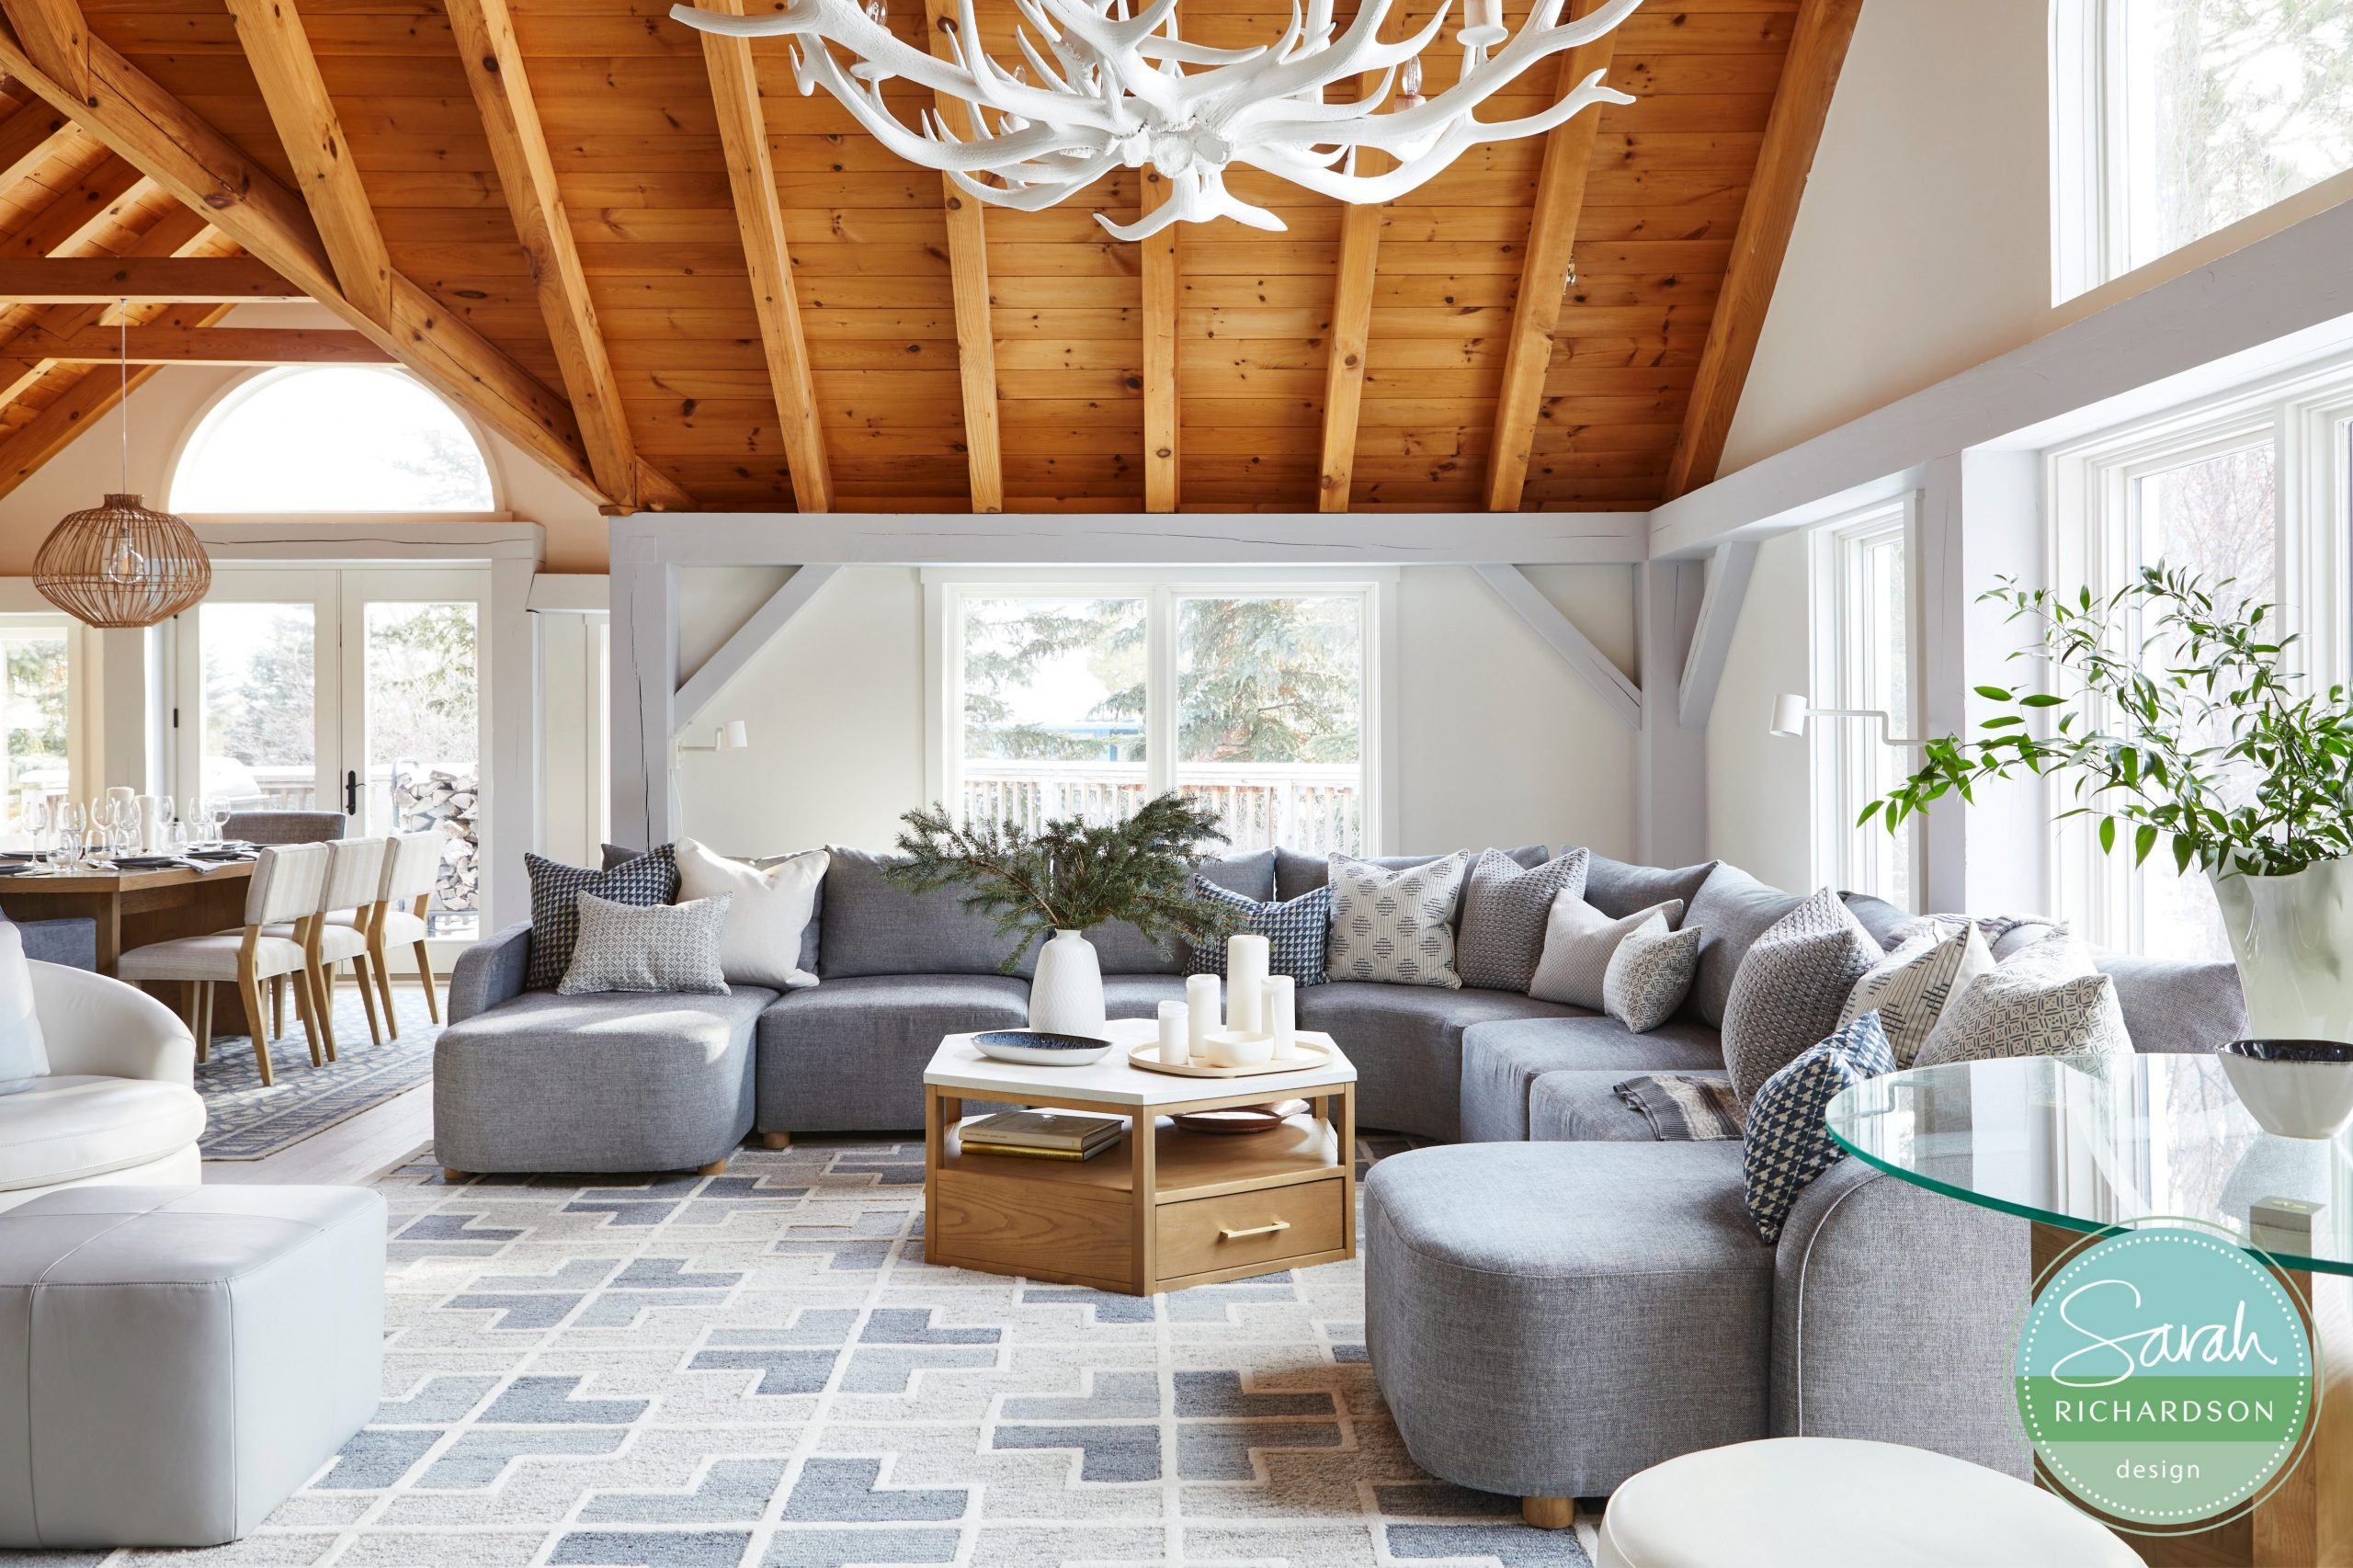 Normerican Timber Frames, Sarah Richardson Design, Living Room, Painted Timbers, Natural Timbers